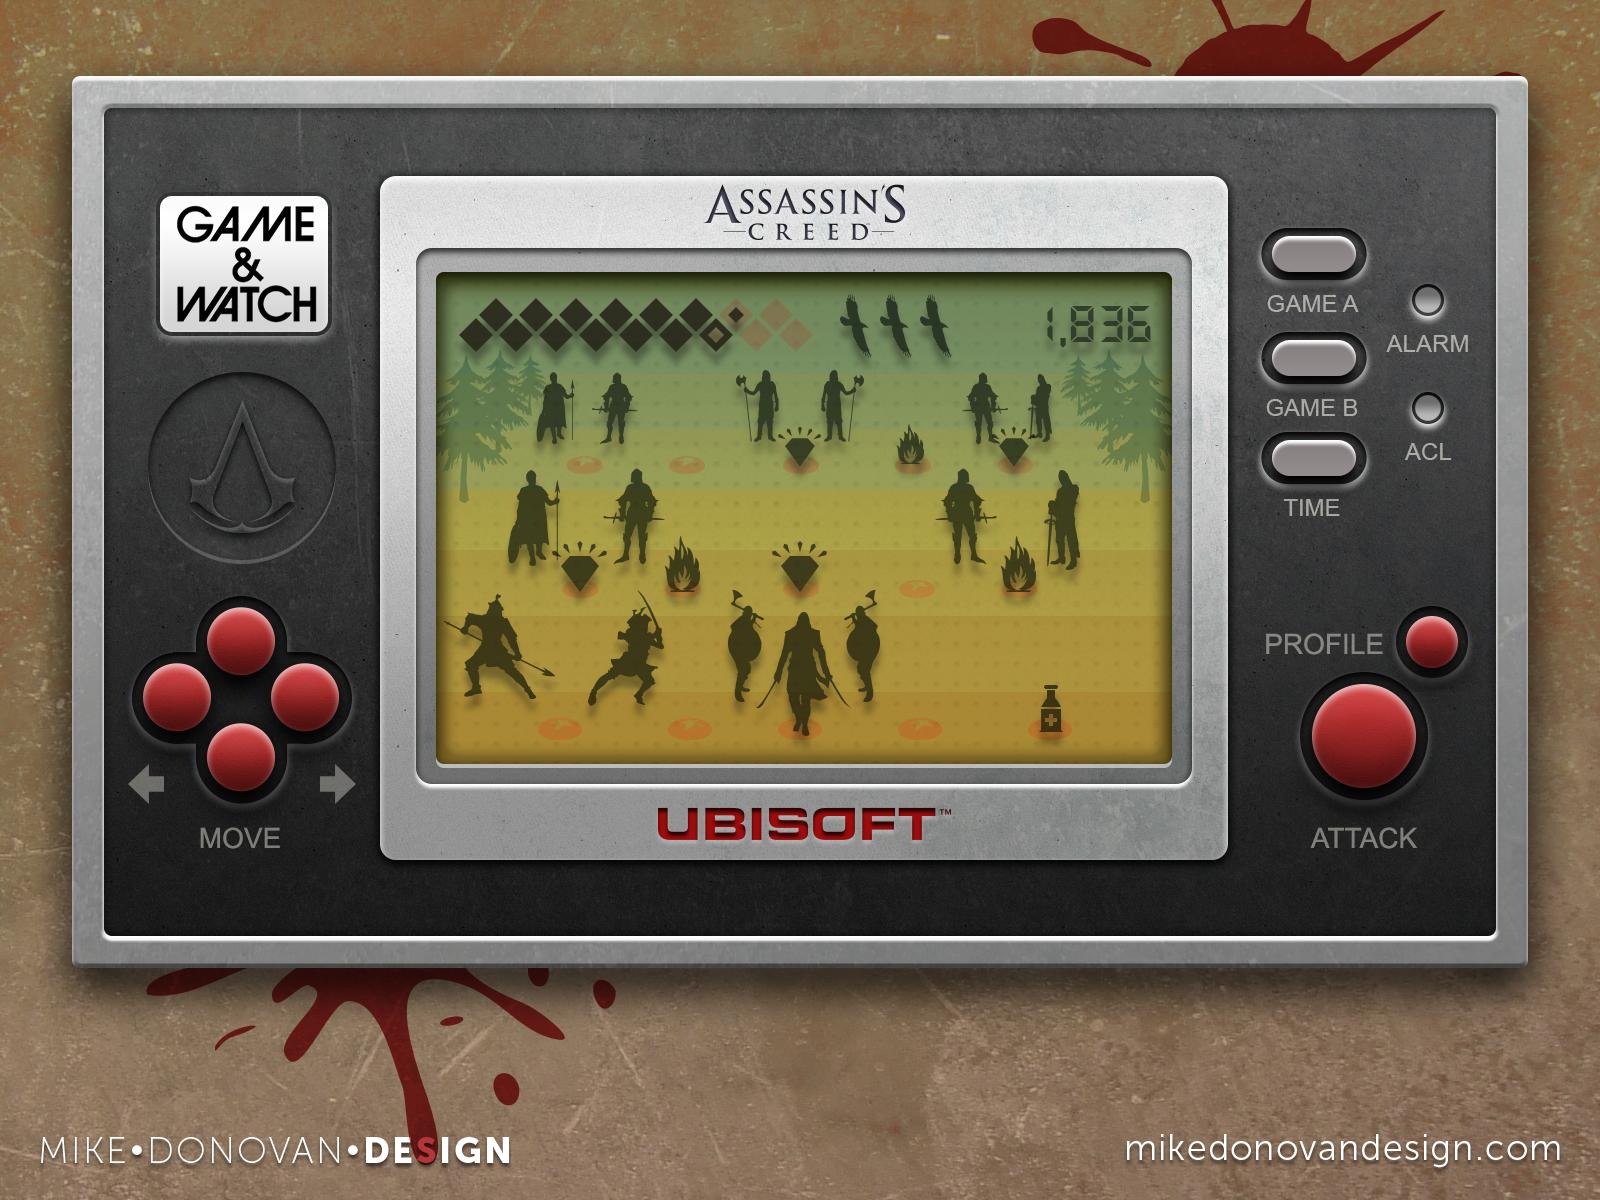 Mikedonovandesign game assassins creed